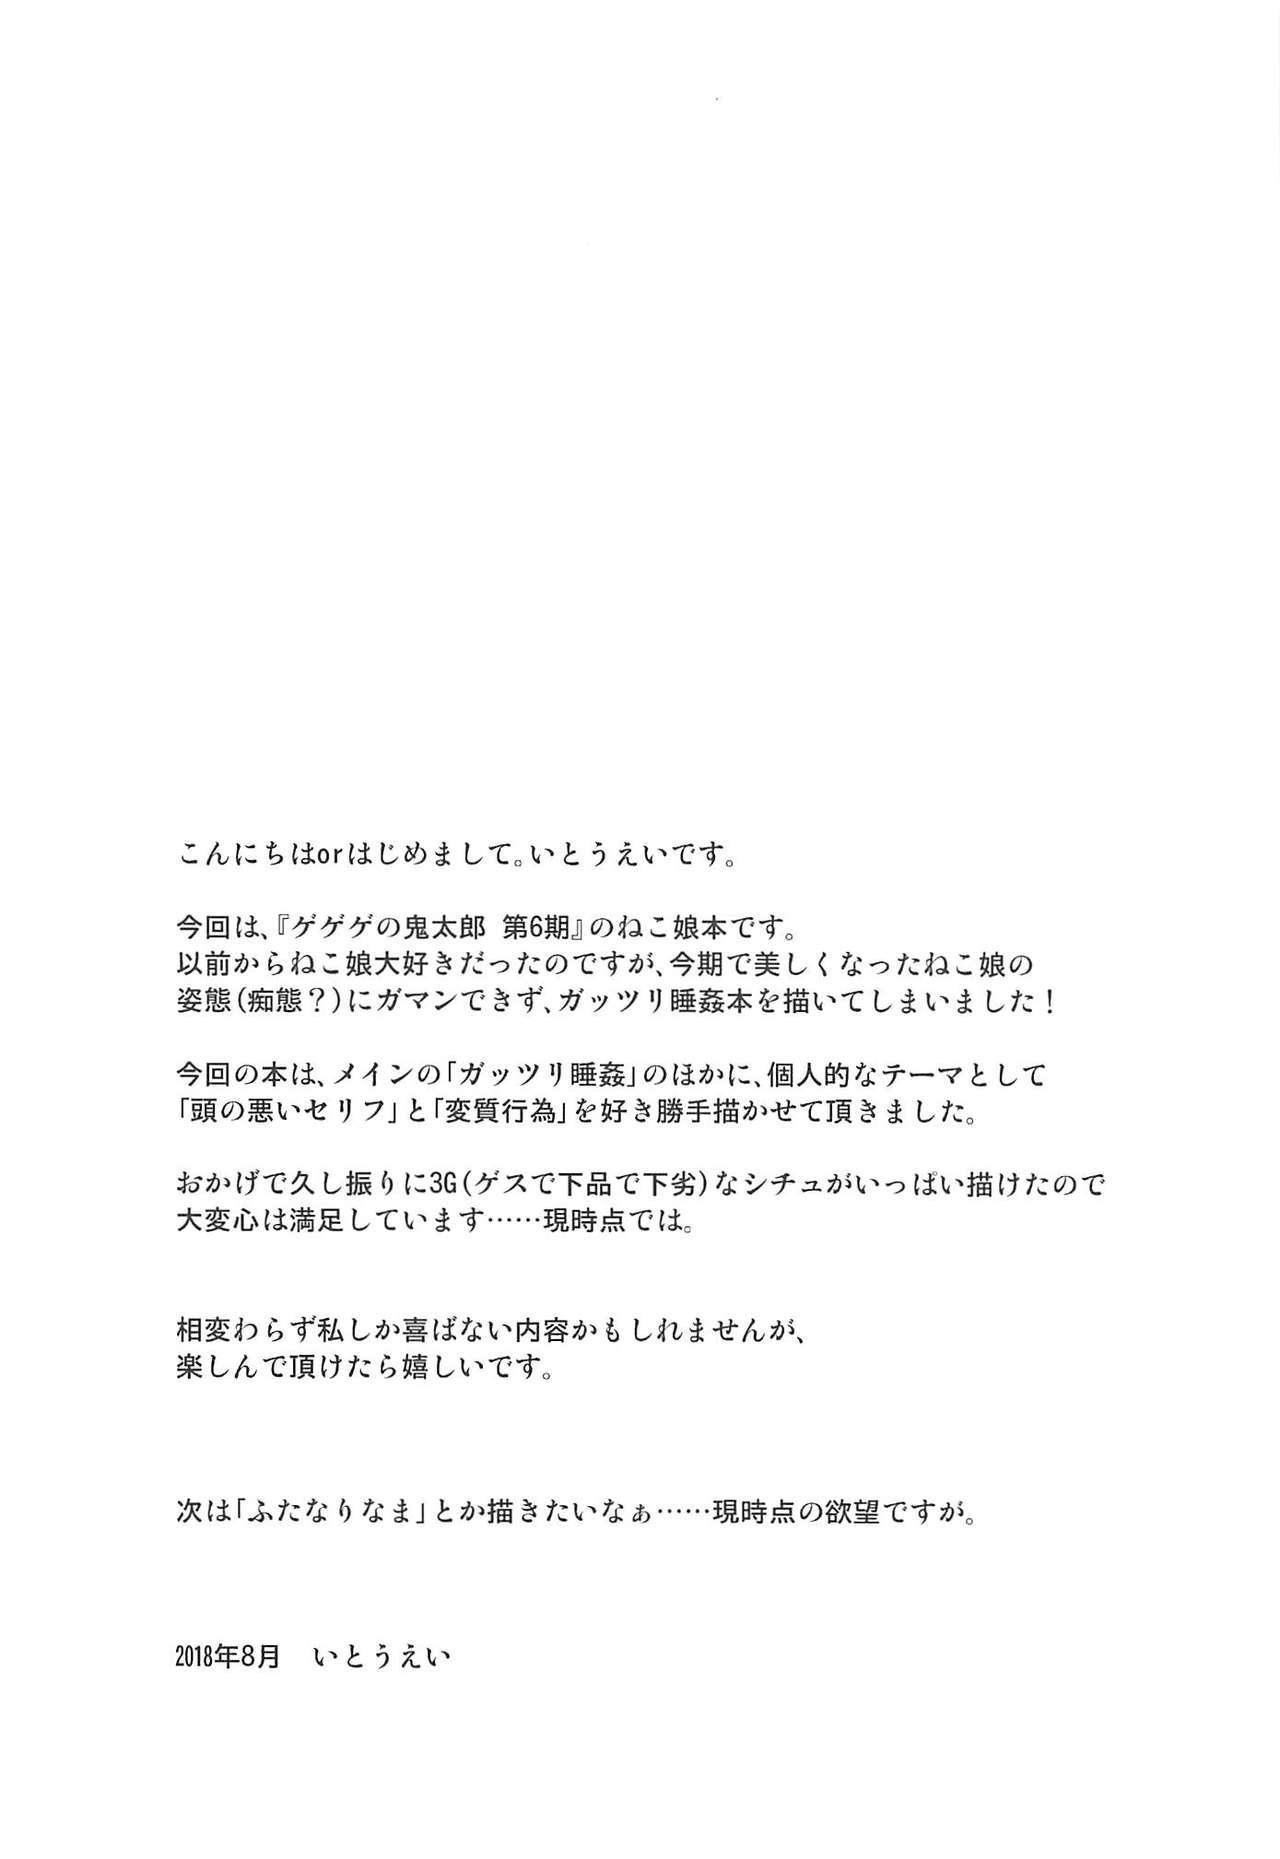 Neko Musume Suikan 2